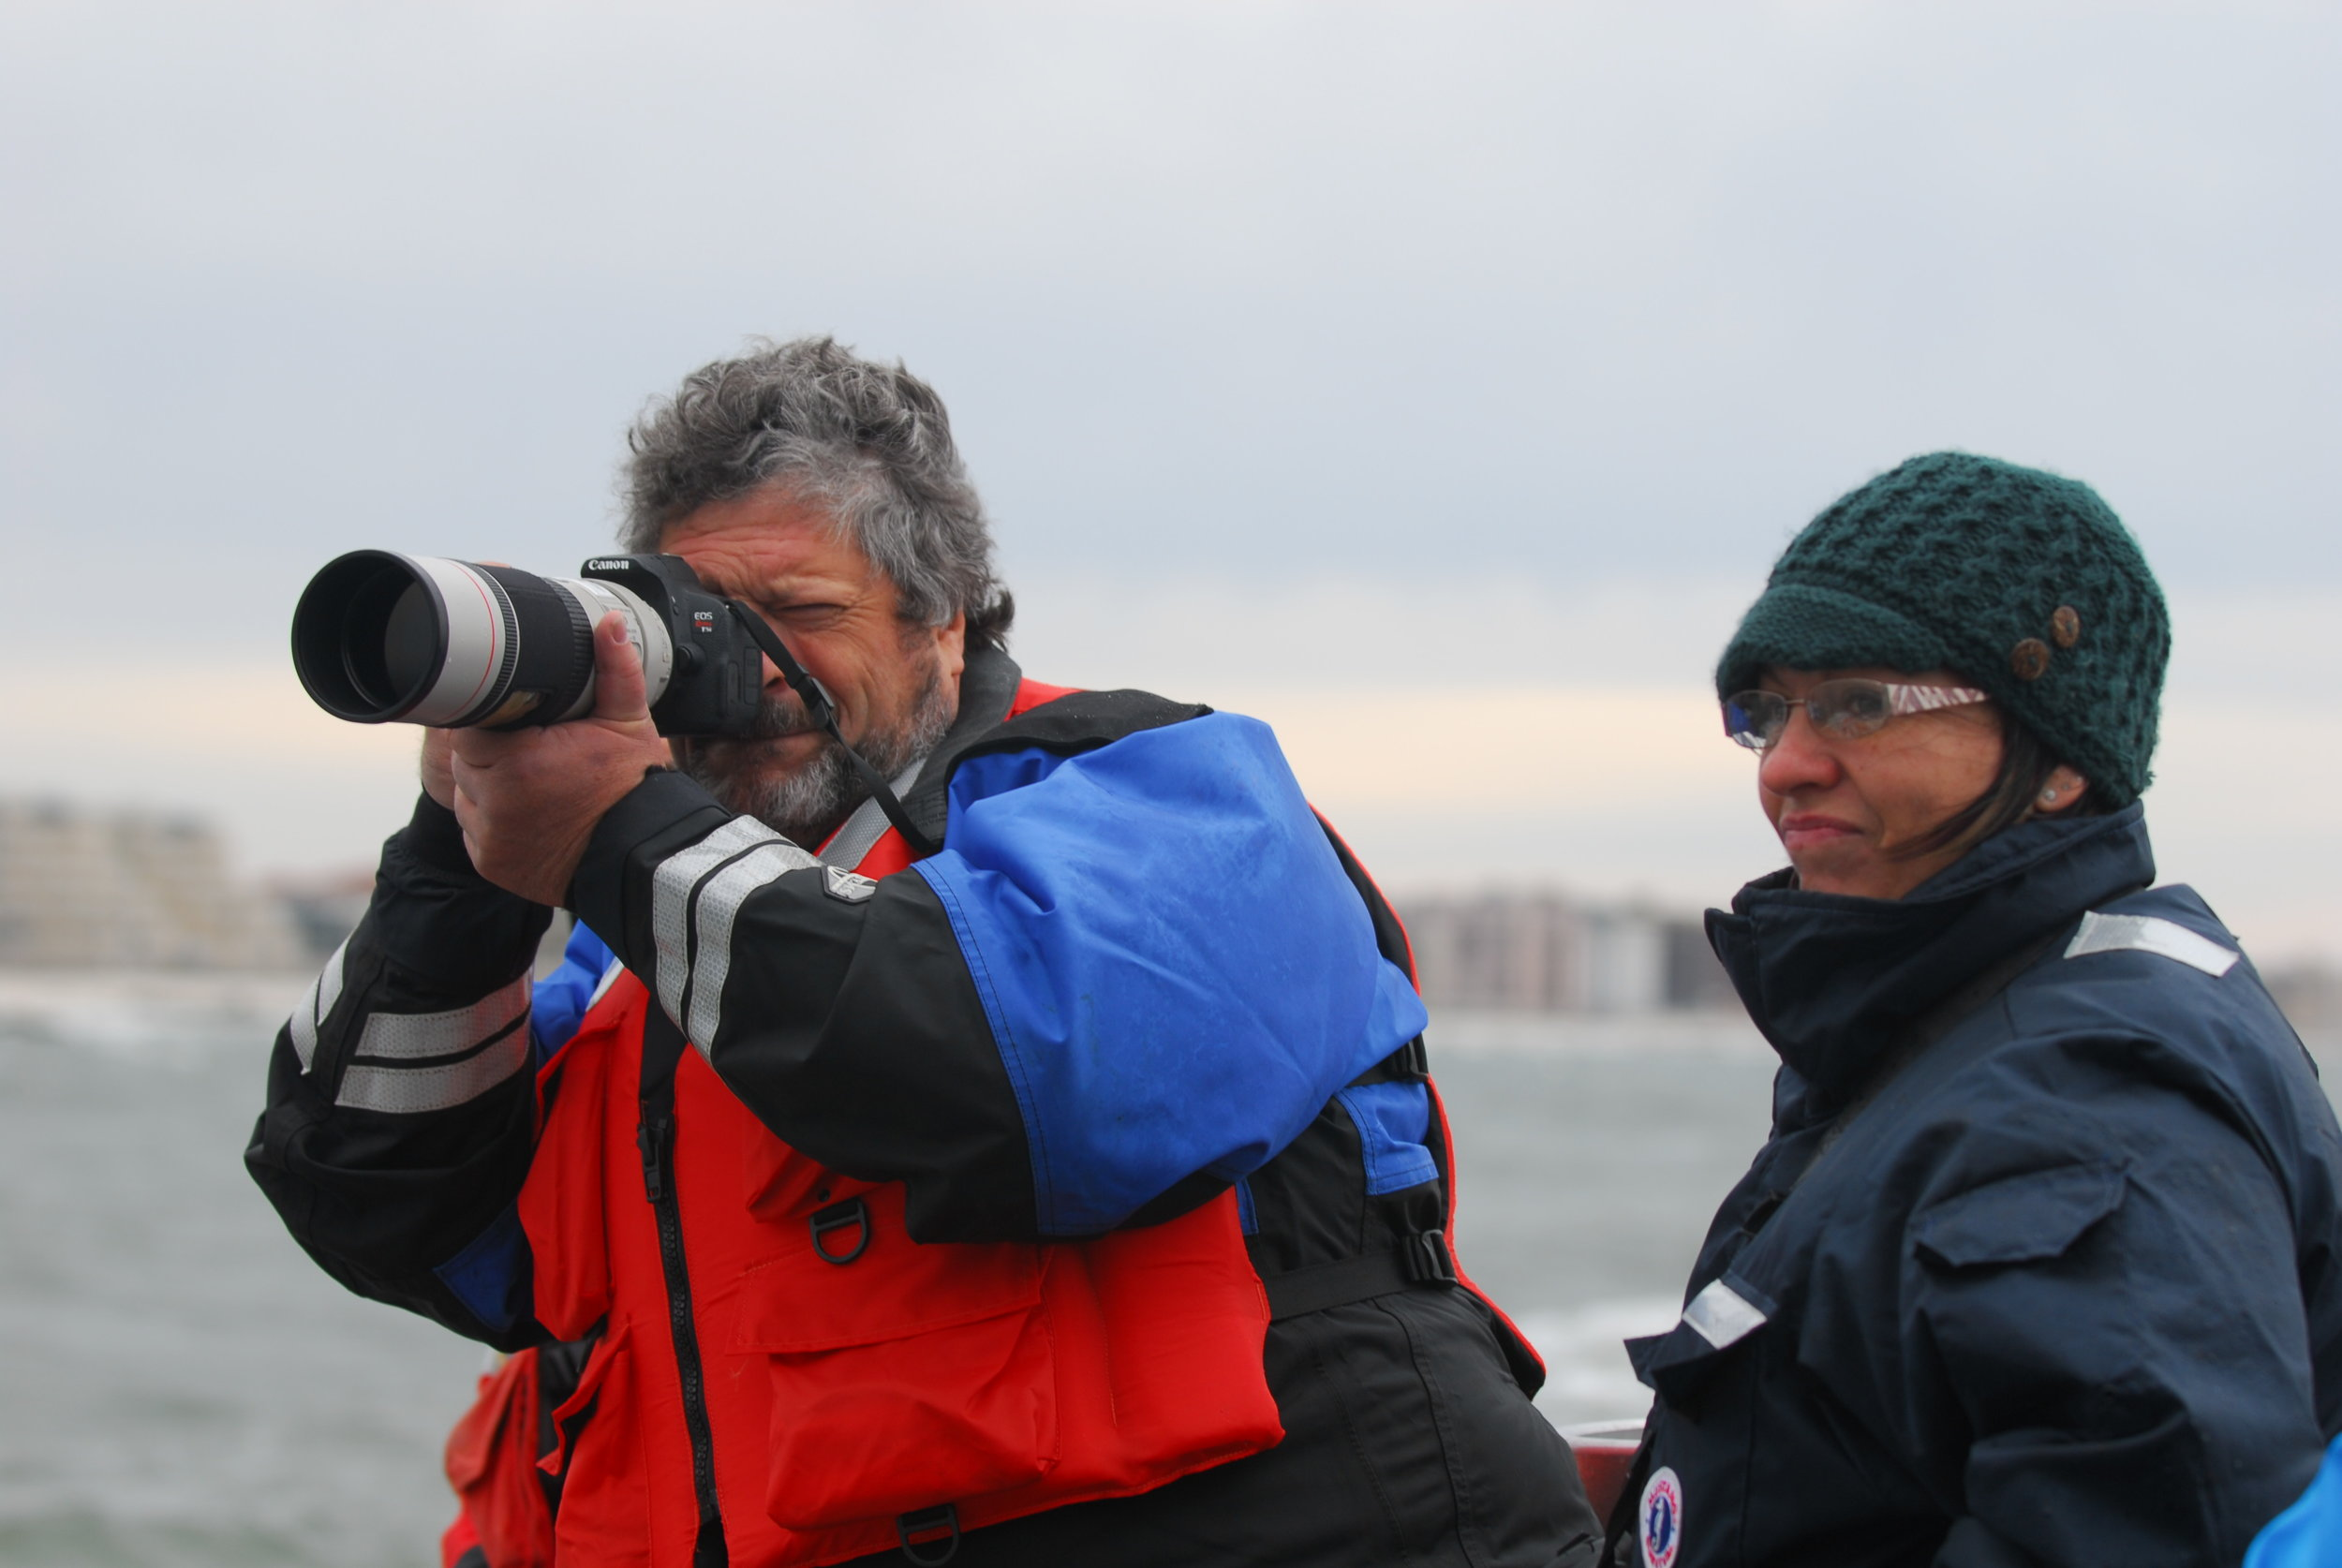 Rob DiGiovanni and Mendy Garron_US Coast Guard Photo.JPG